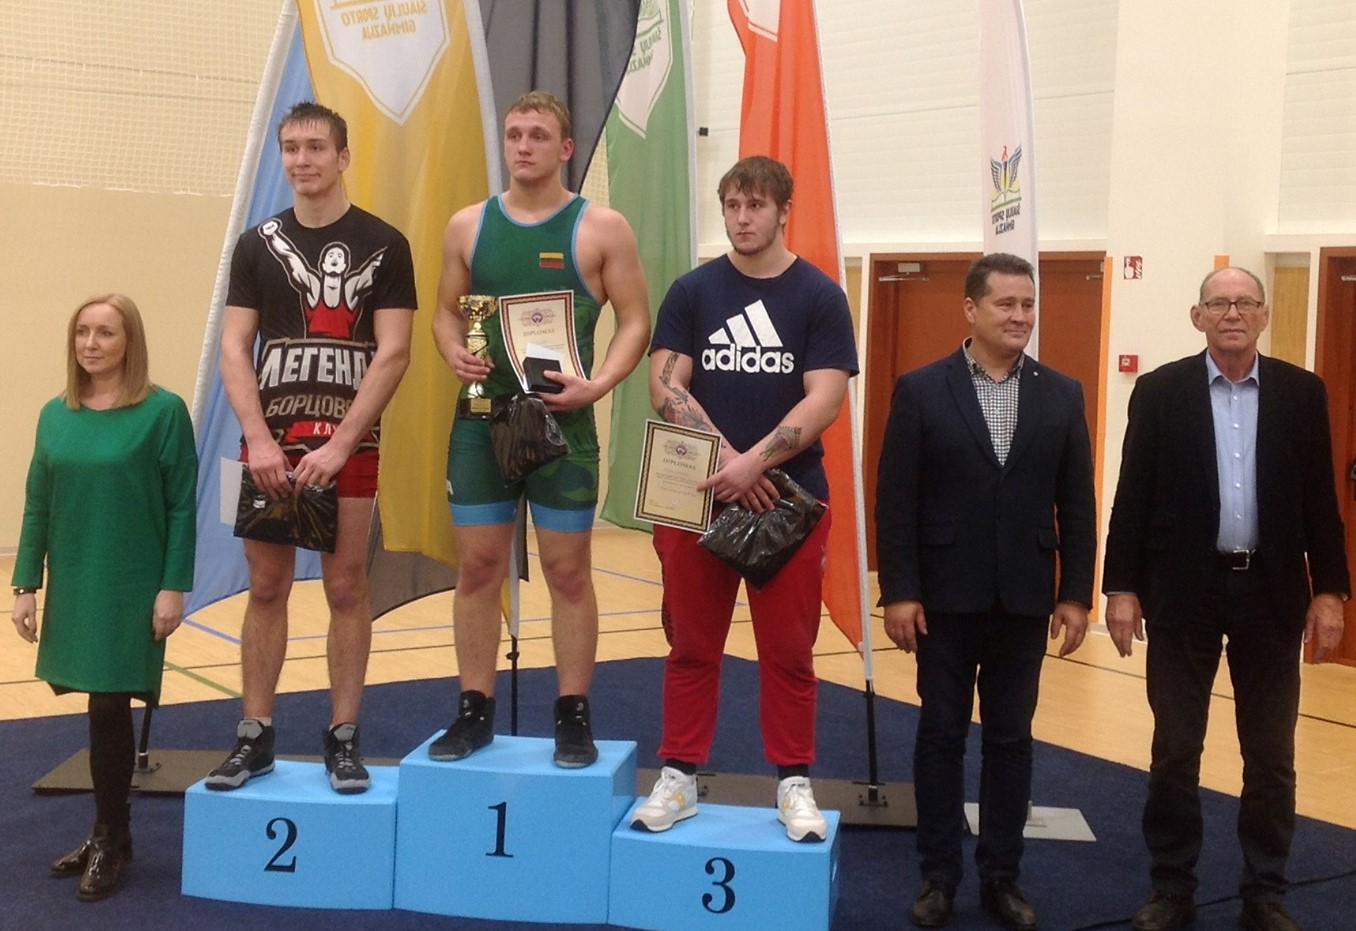 2019 m. R.Bagdono turnyras. E. Čerepokas - I vieta